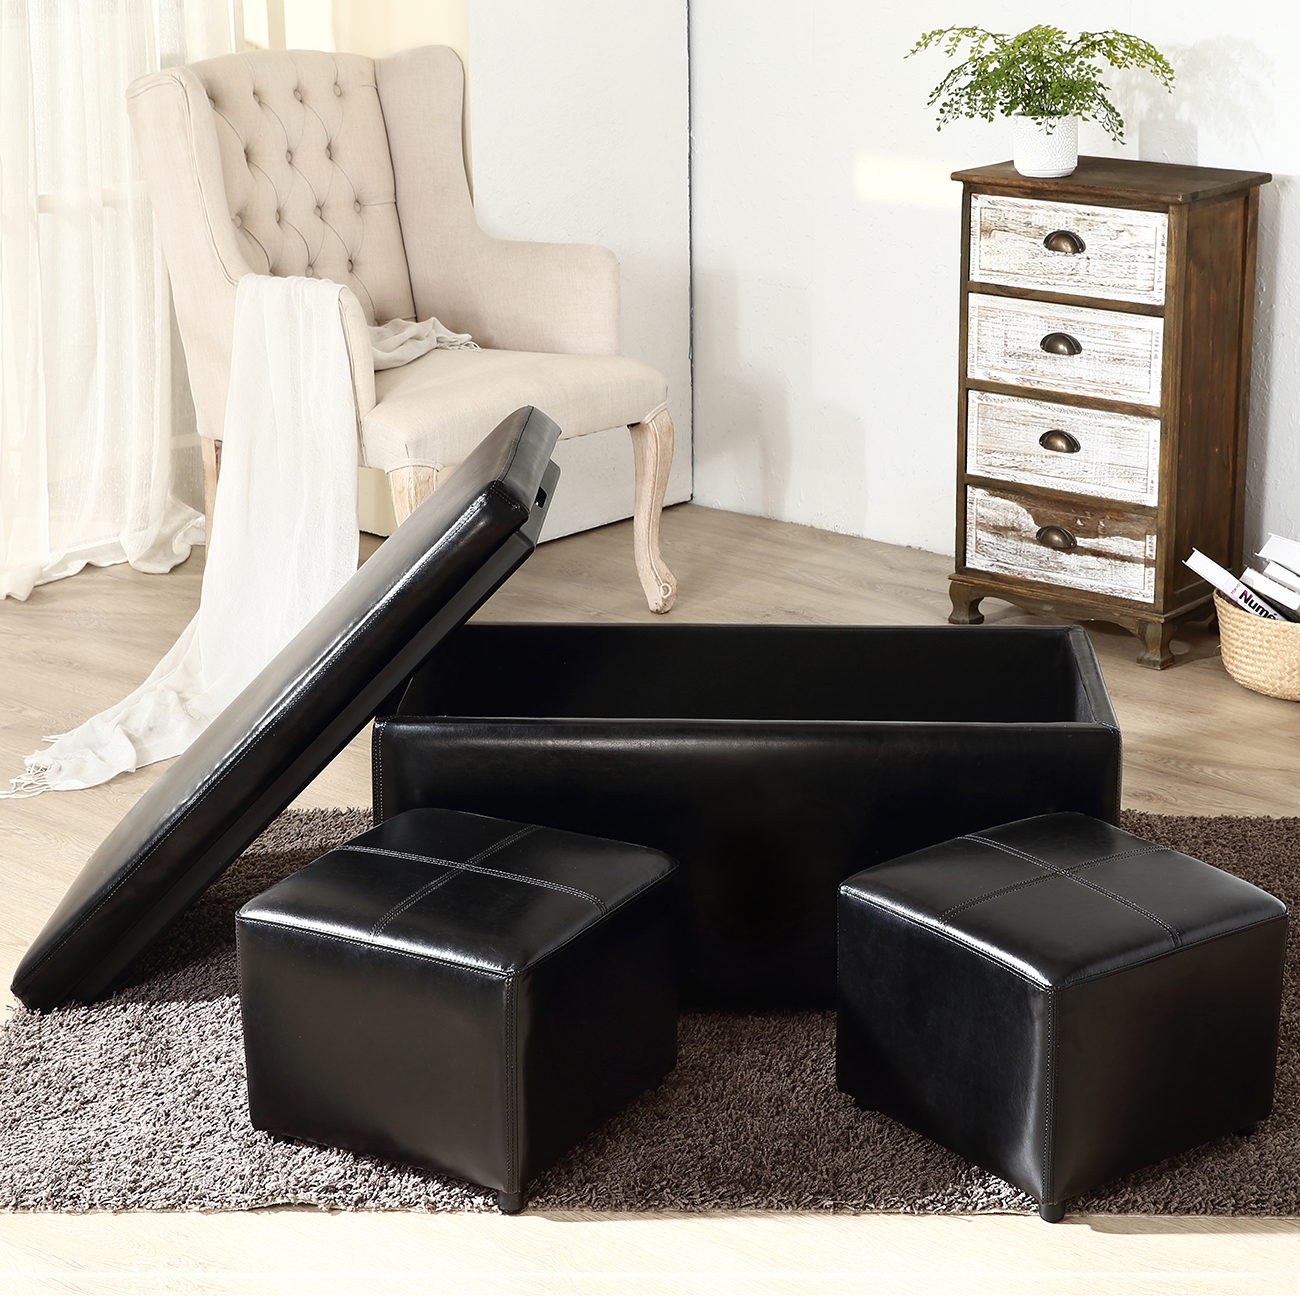 High Quality 3PC Ottoman Bench Storage Lid Tray Footrest Coffee